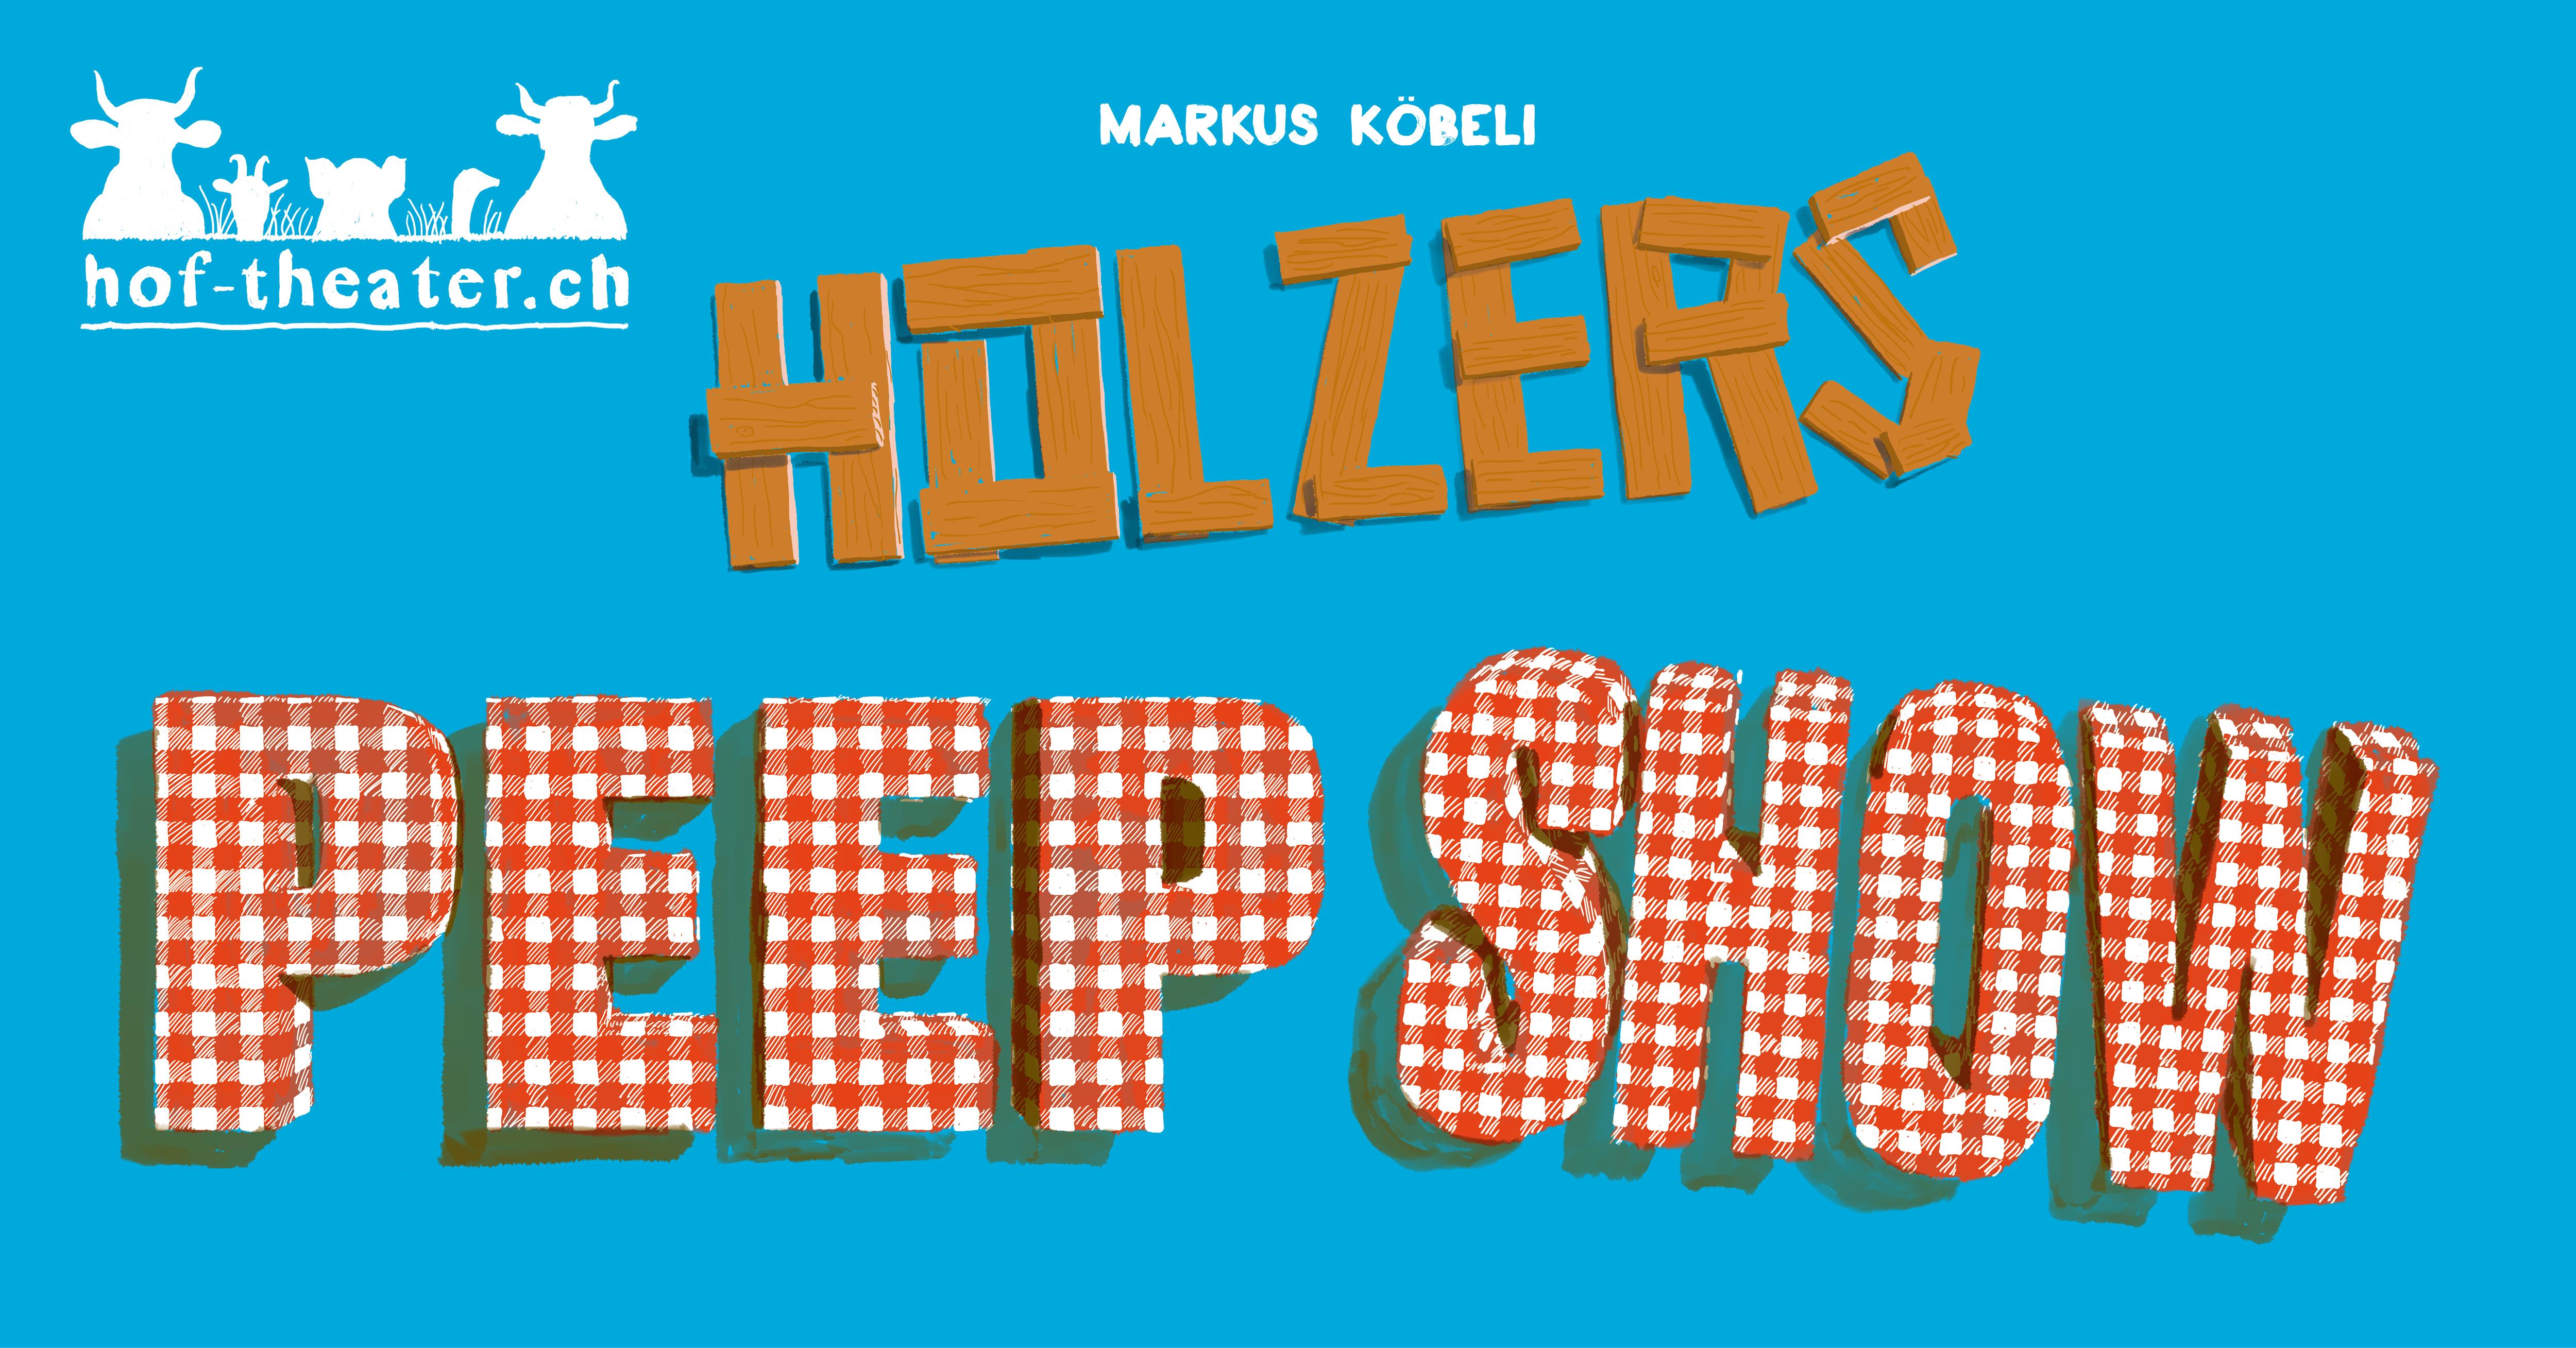 Hof-Theater: Holzers Peepshow